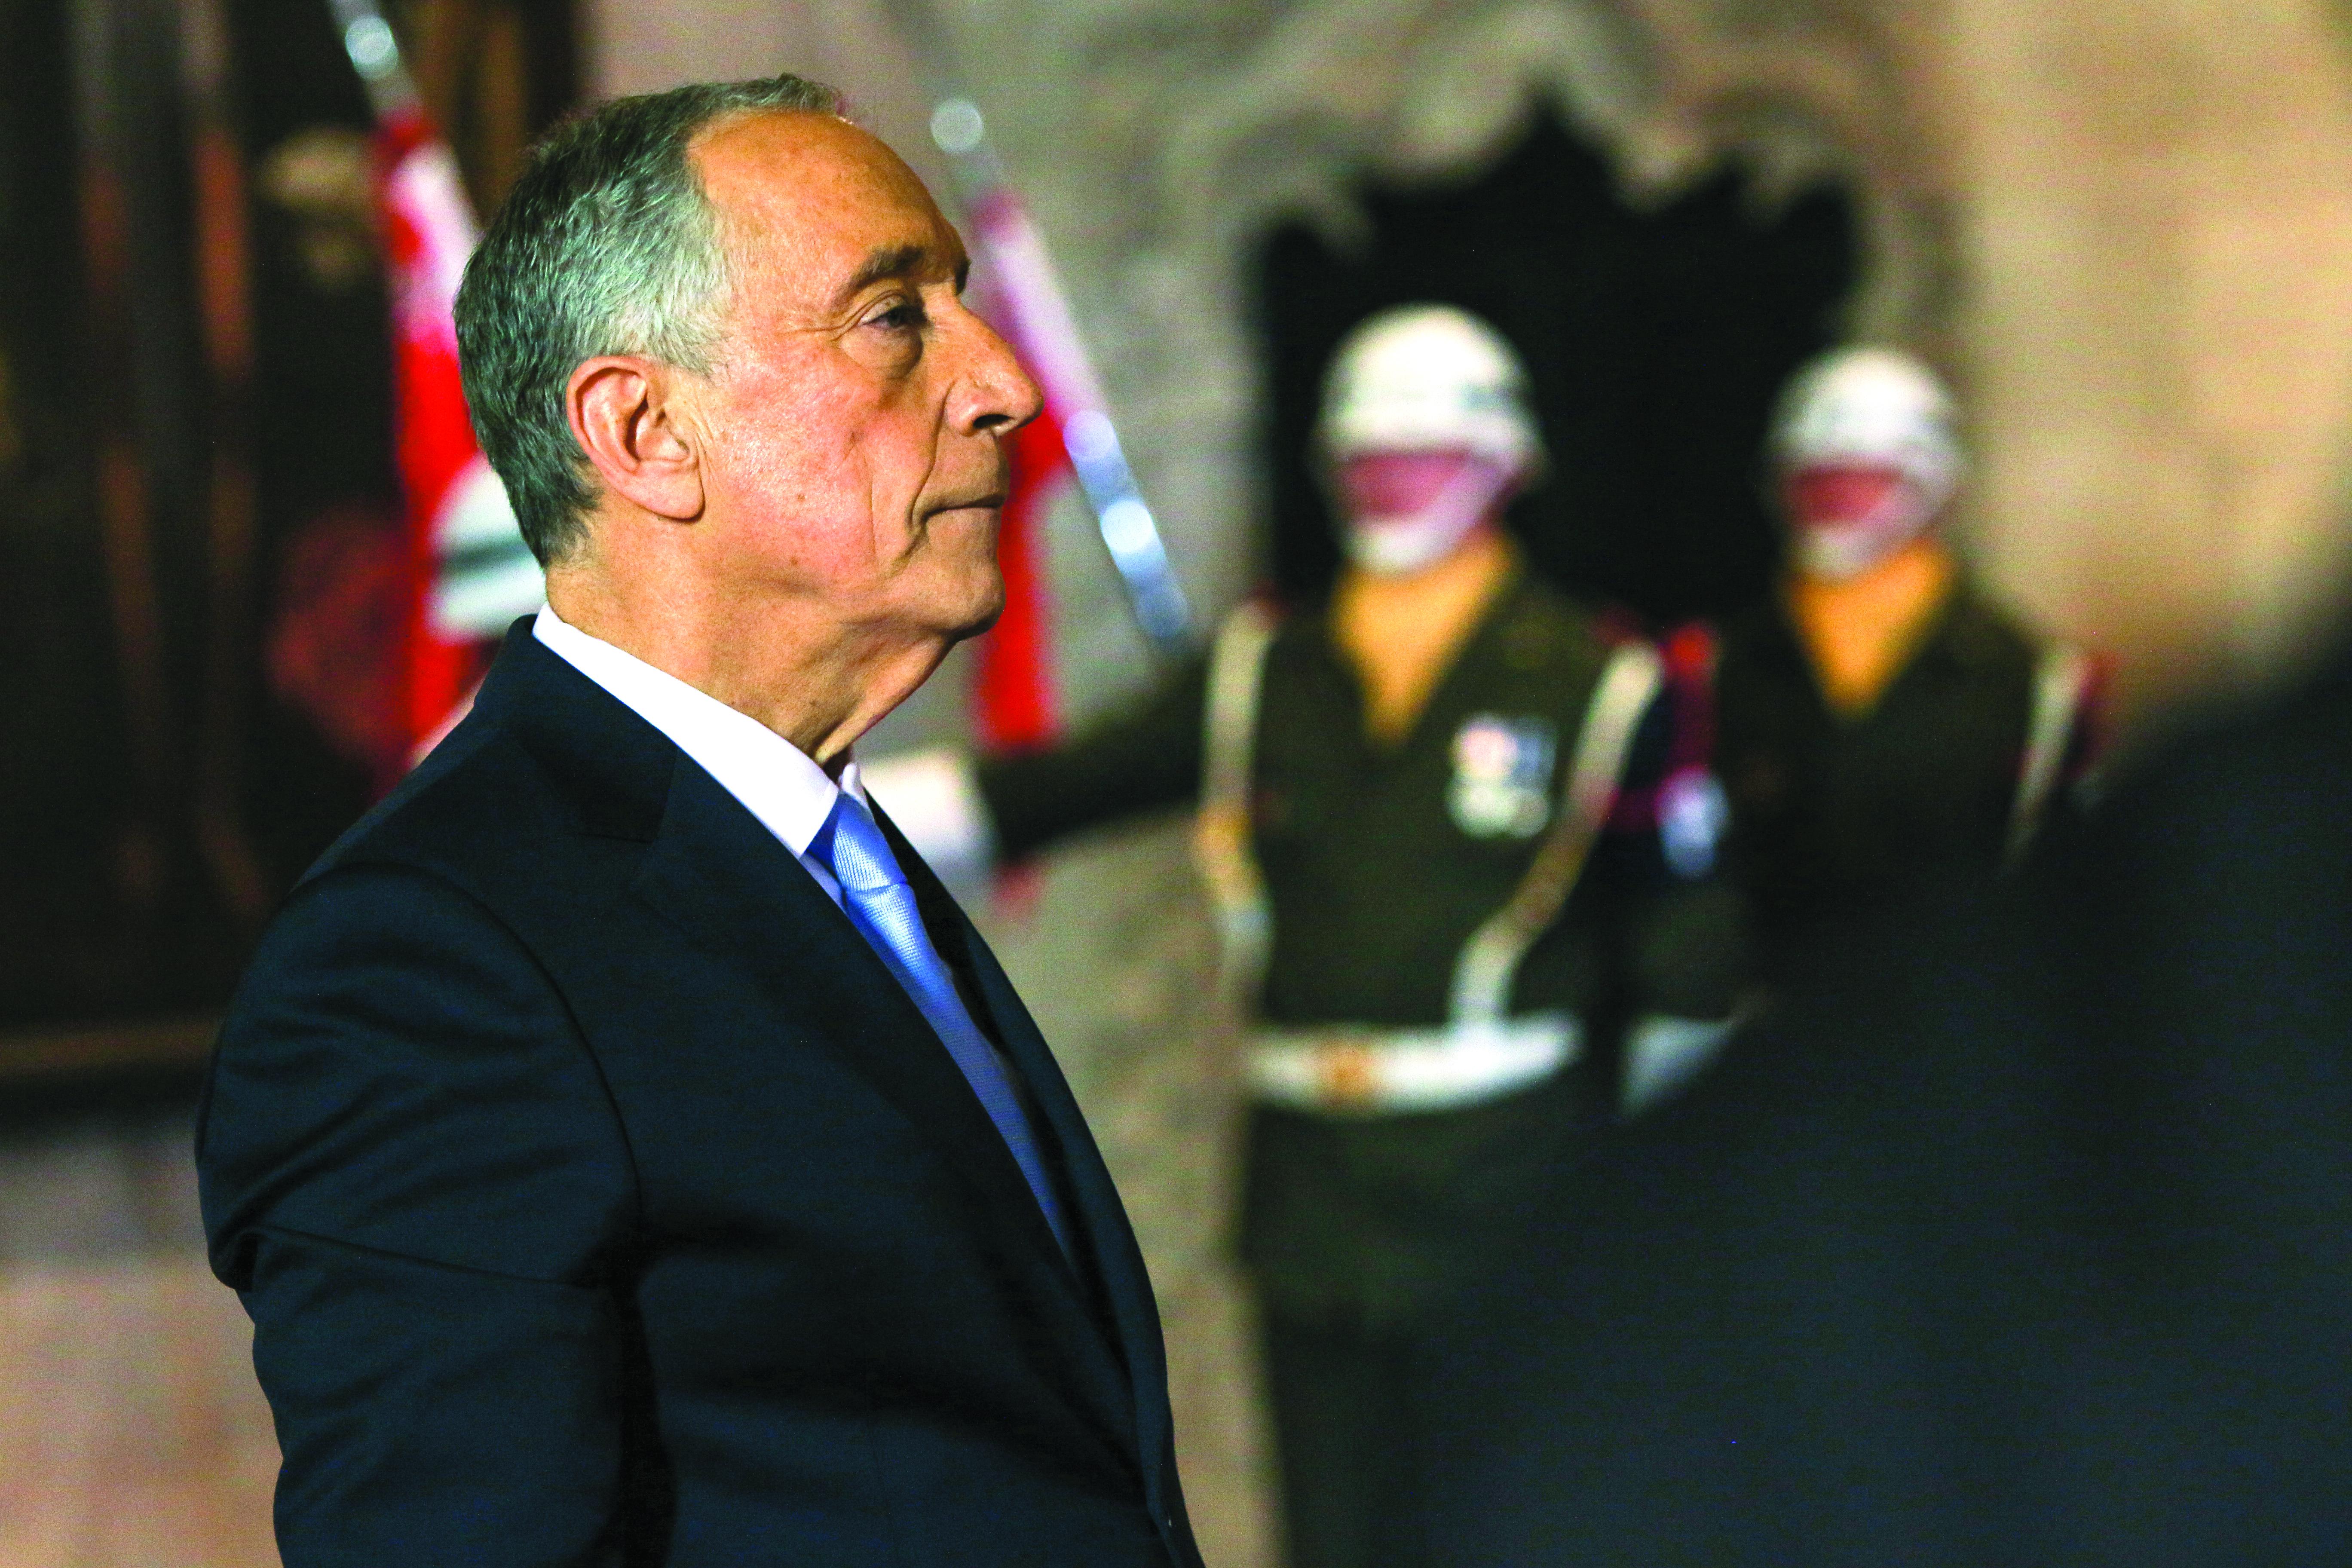 Marcelo vai convocar Conselho de Estado e de Defesa